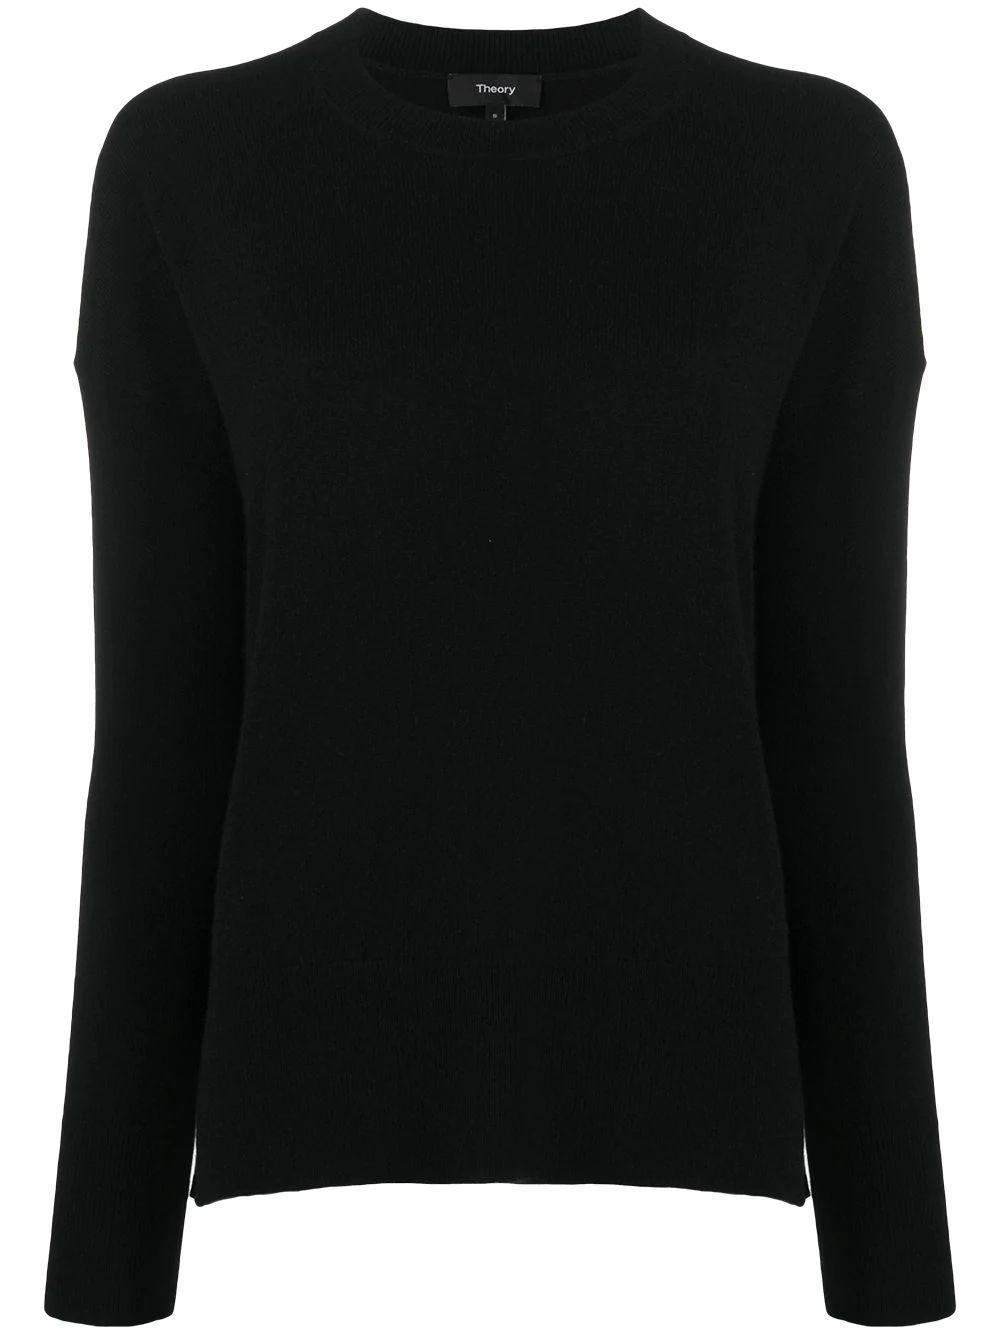 Karenia Cashmere Sweater Item # K0718728